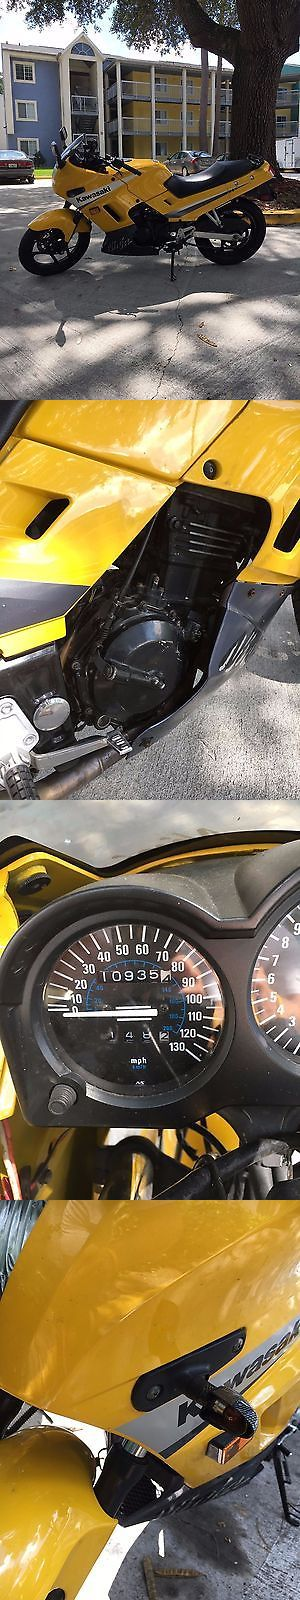 Motorcycles: 2004 Kawasaki Ninja Kawasaki Ninja 250R Sport Bike -> BUY IT NOW ONLY: $1650 on eBay!